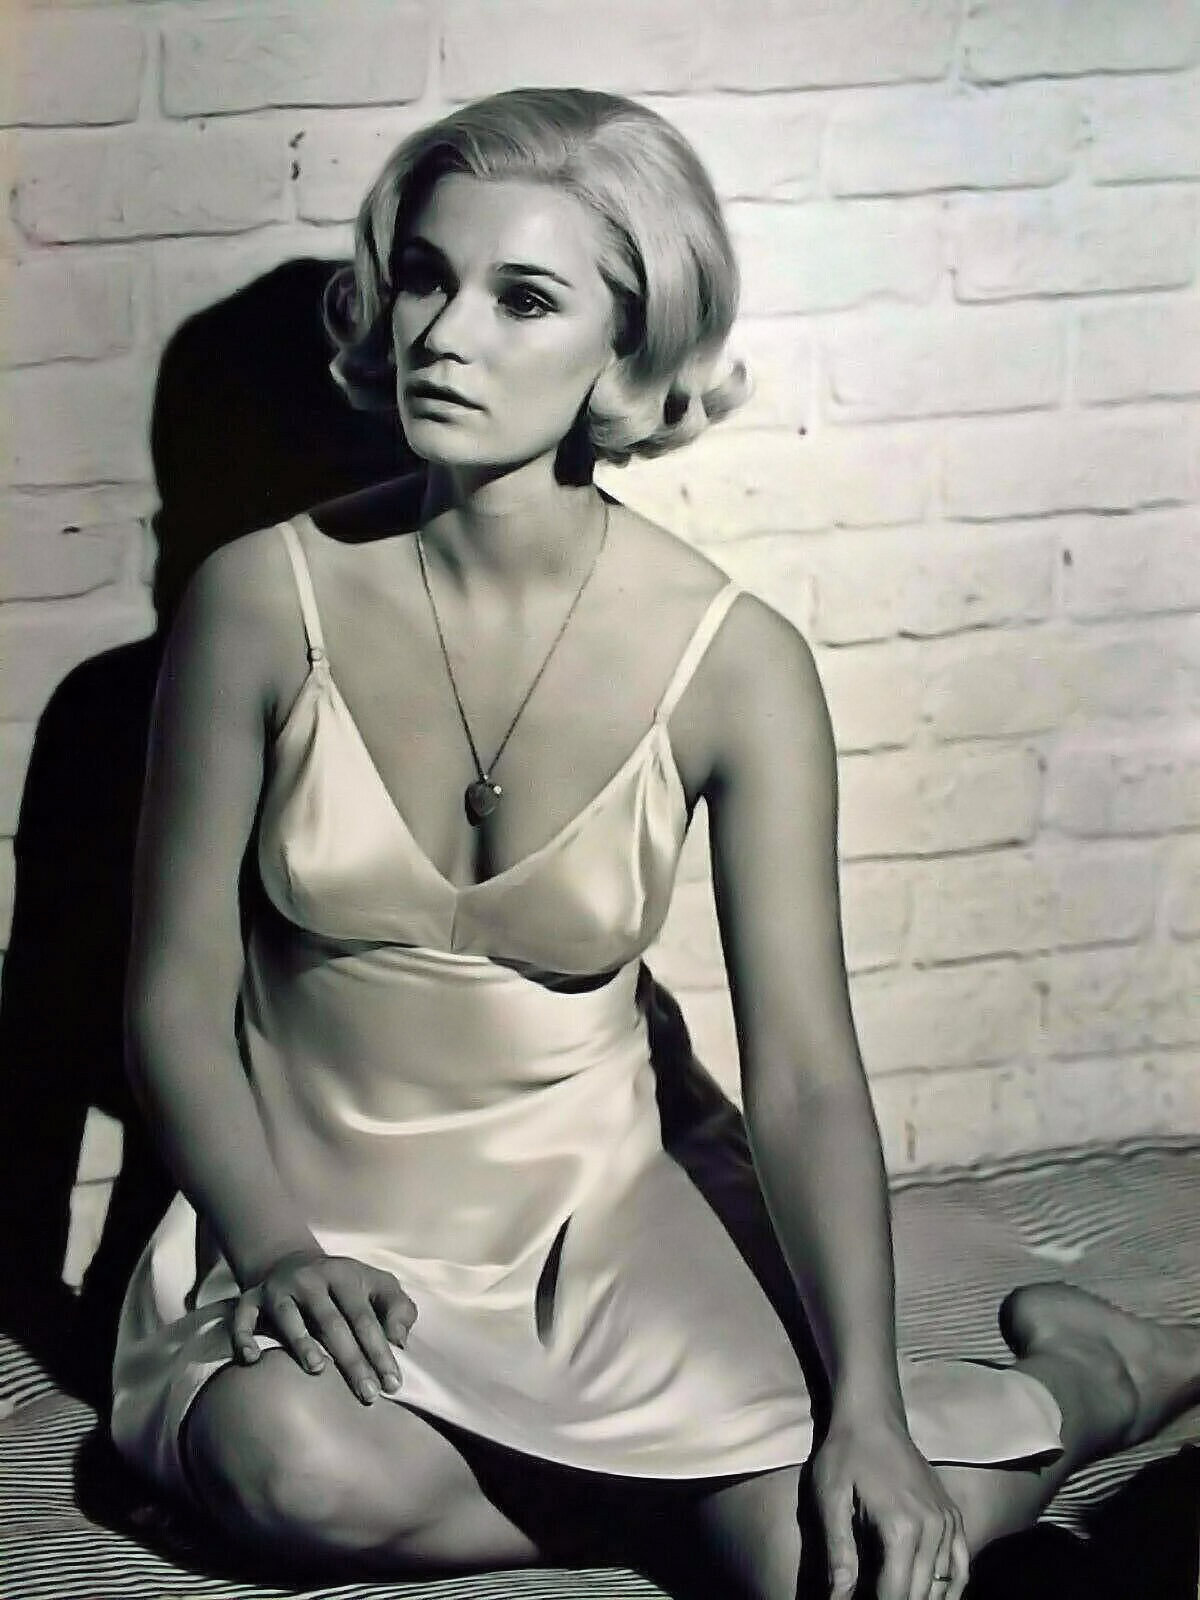 Yvette Mimieux boobs cleavage